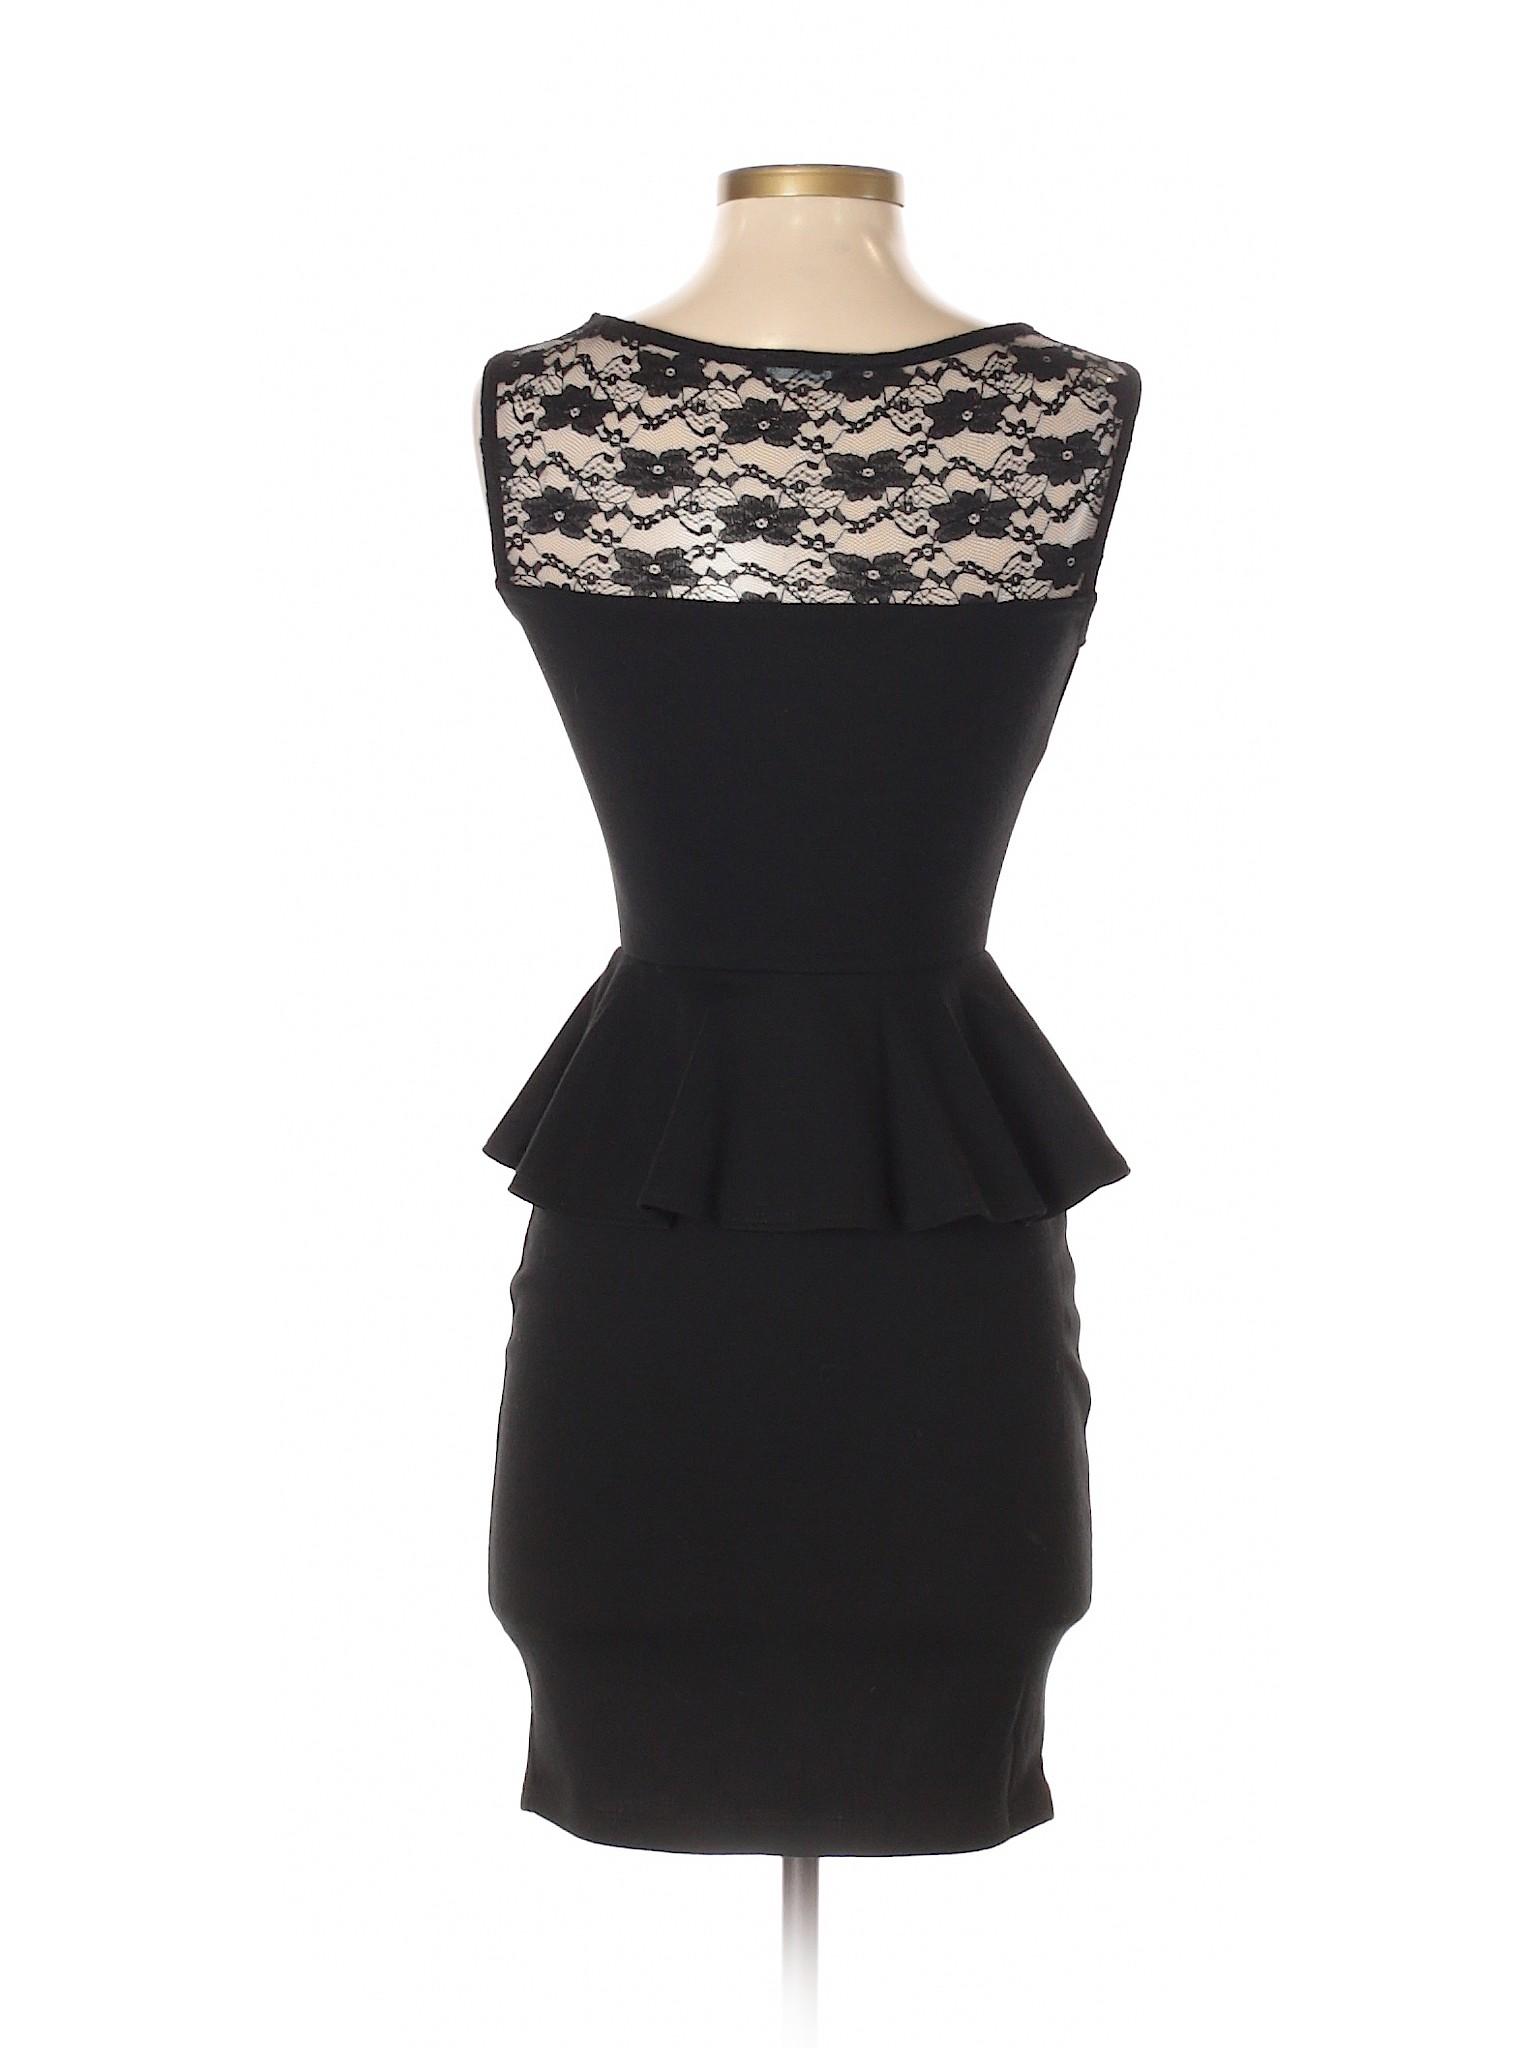 Dress winter Casual winter Casual Boutique Boutique Dress Soprano Boutique Soprano winter Swxq5A1